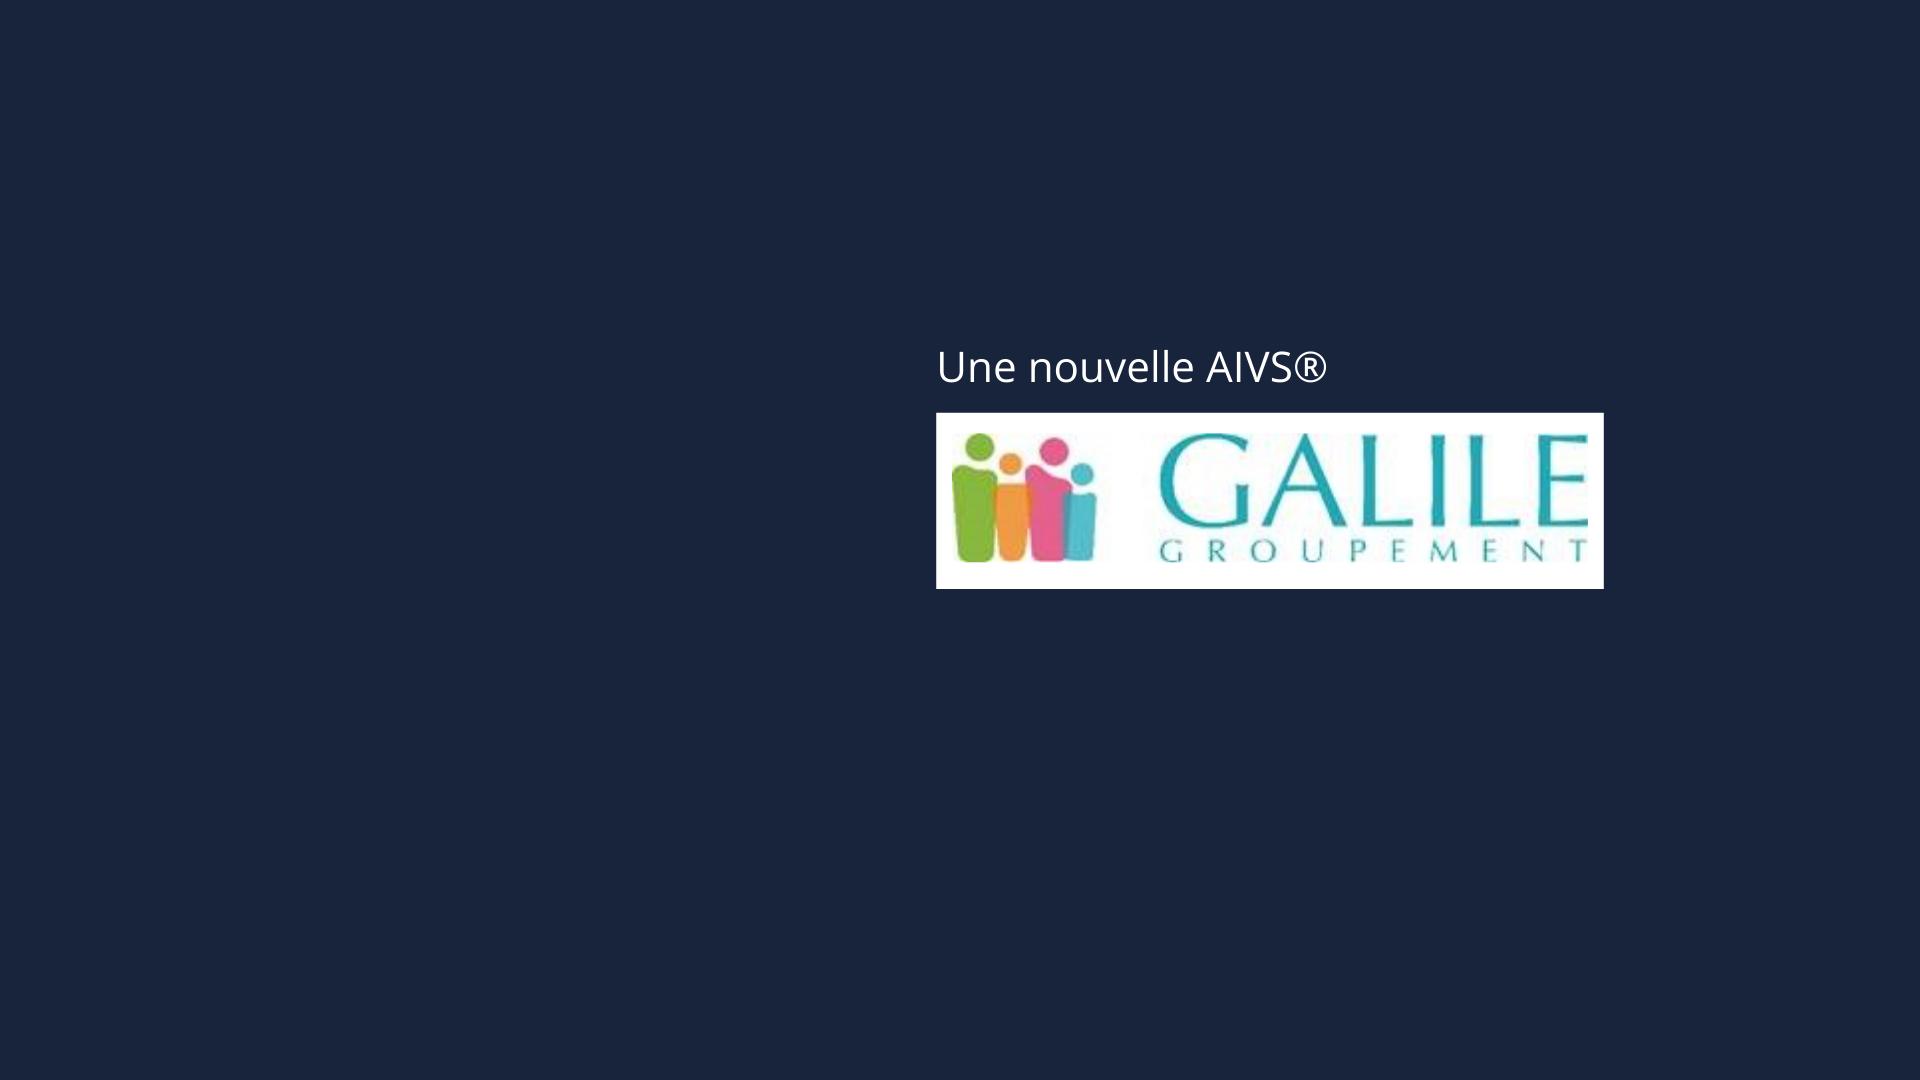 Nouvelle AIVS GALILE